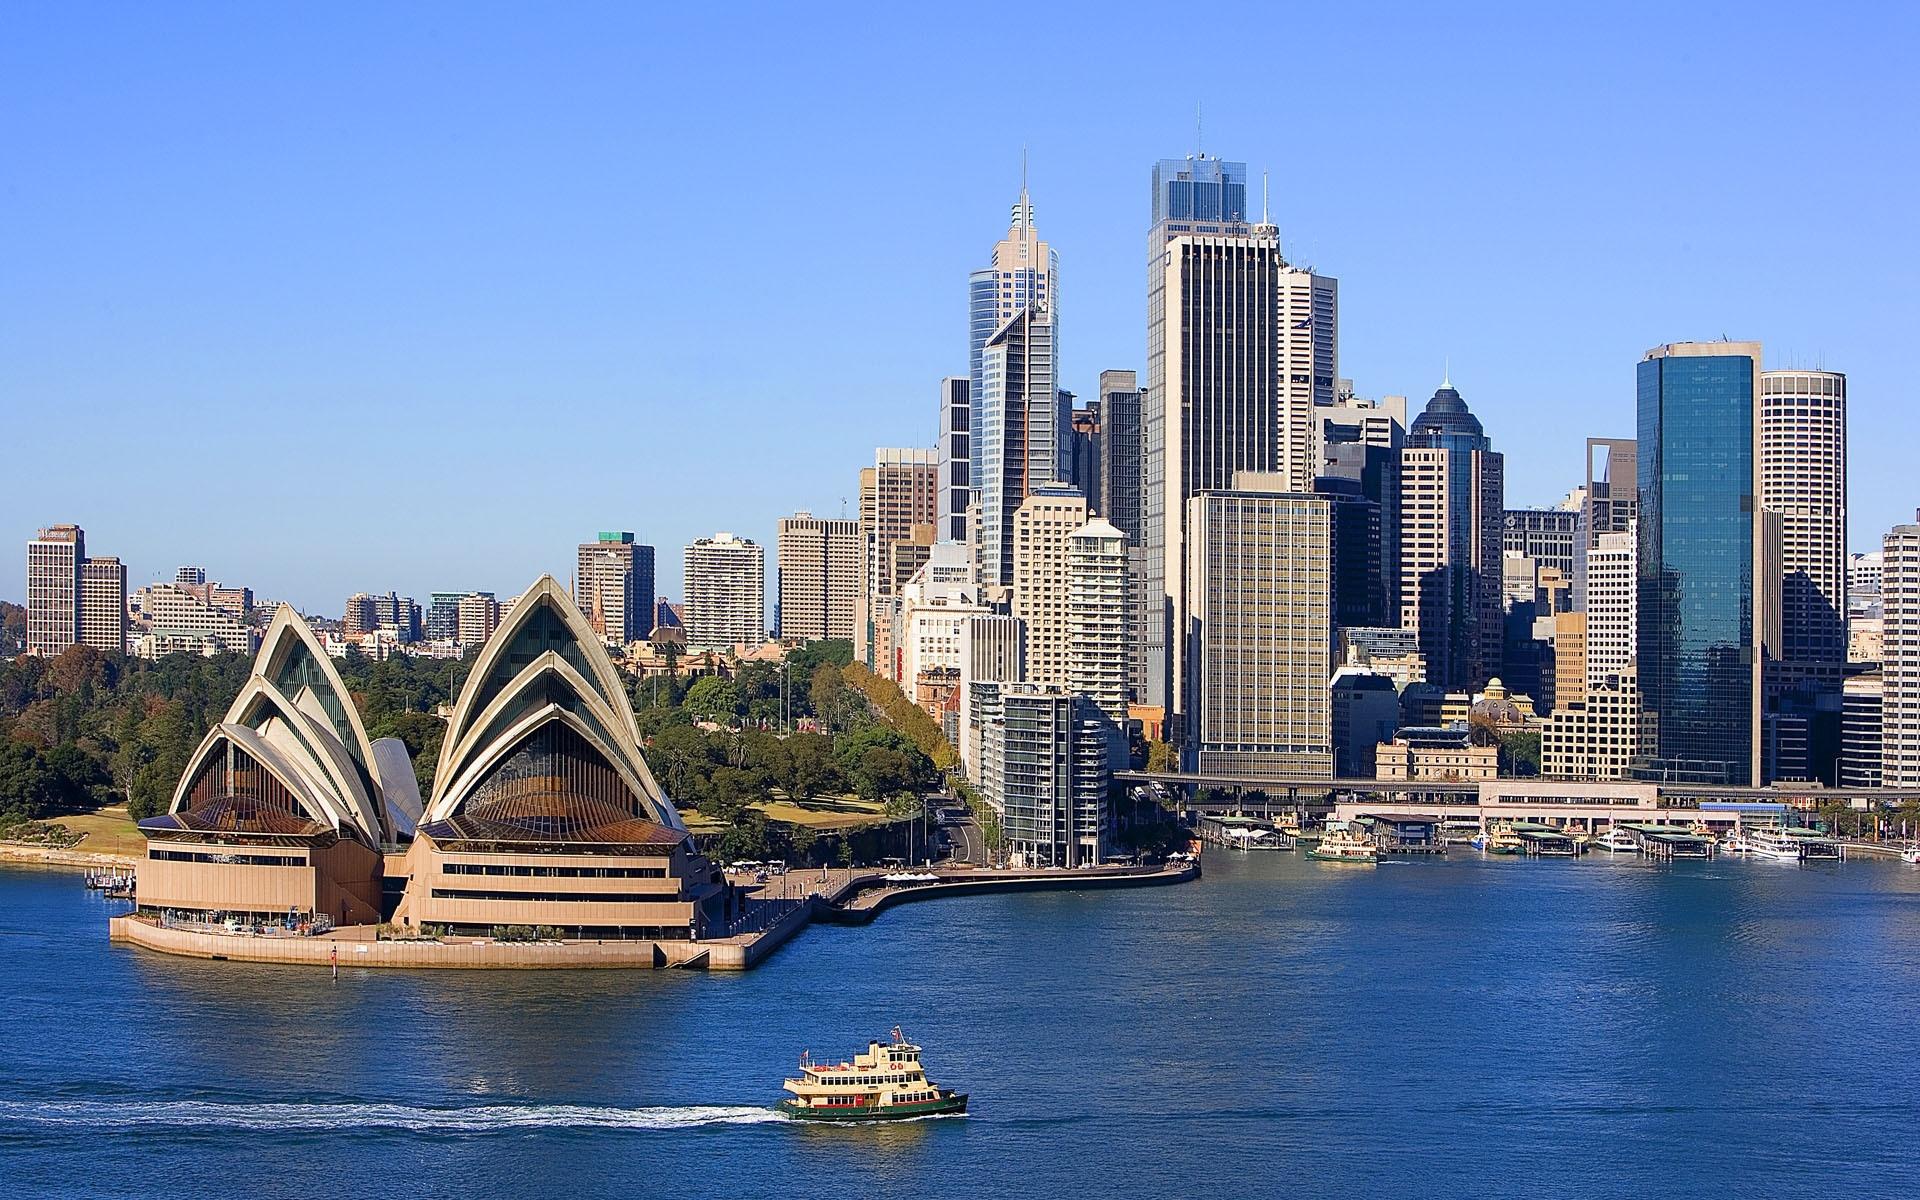 http://3.bp.blogspot.com/-qqfuznoyeGM/UEYP36-FMaI/AAAAAAAAExk/GTe56_uWyOM/s1920/australias-south-east-1200.jpg